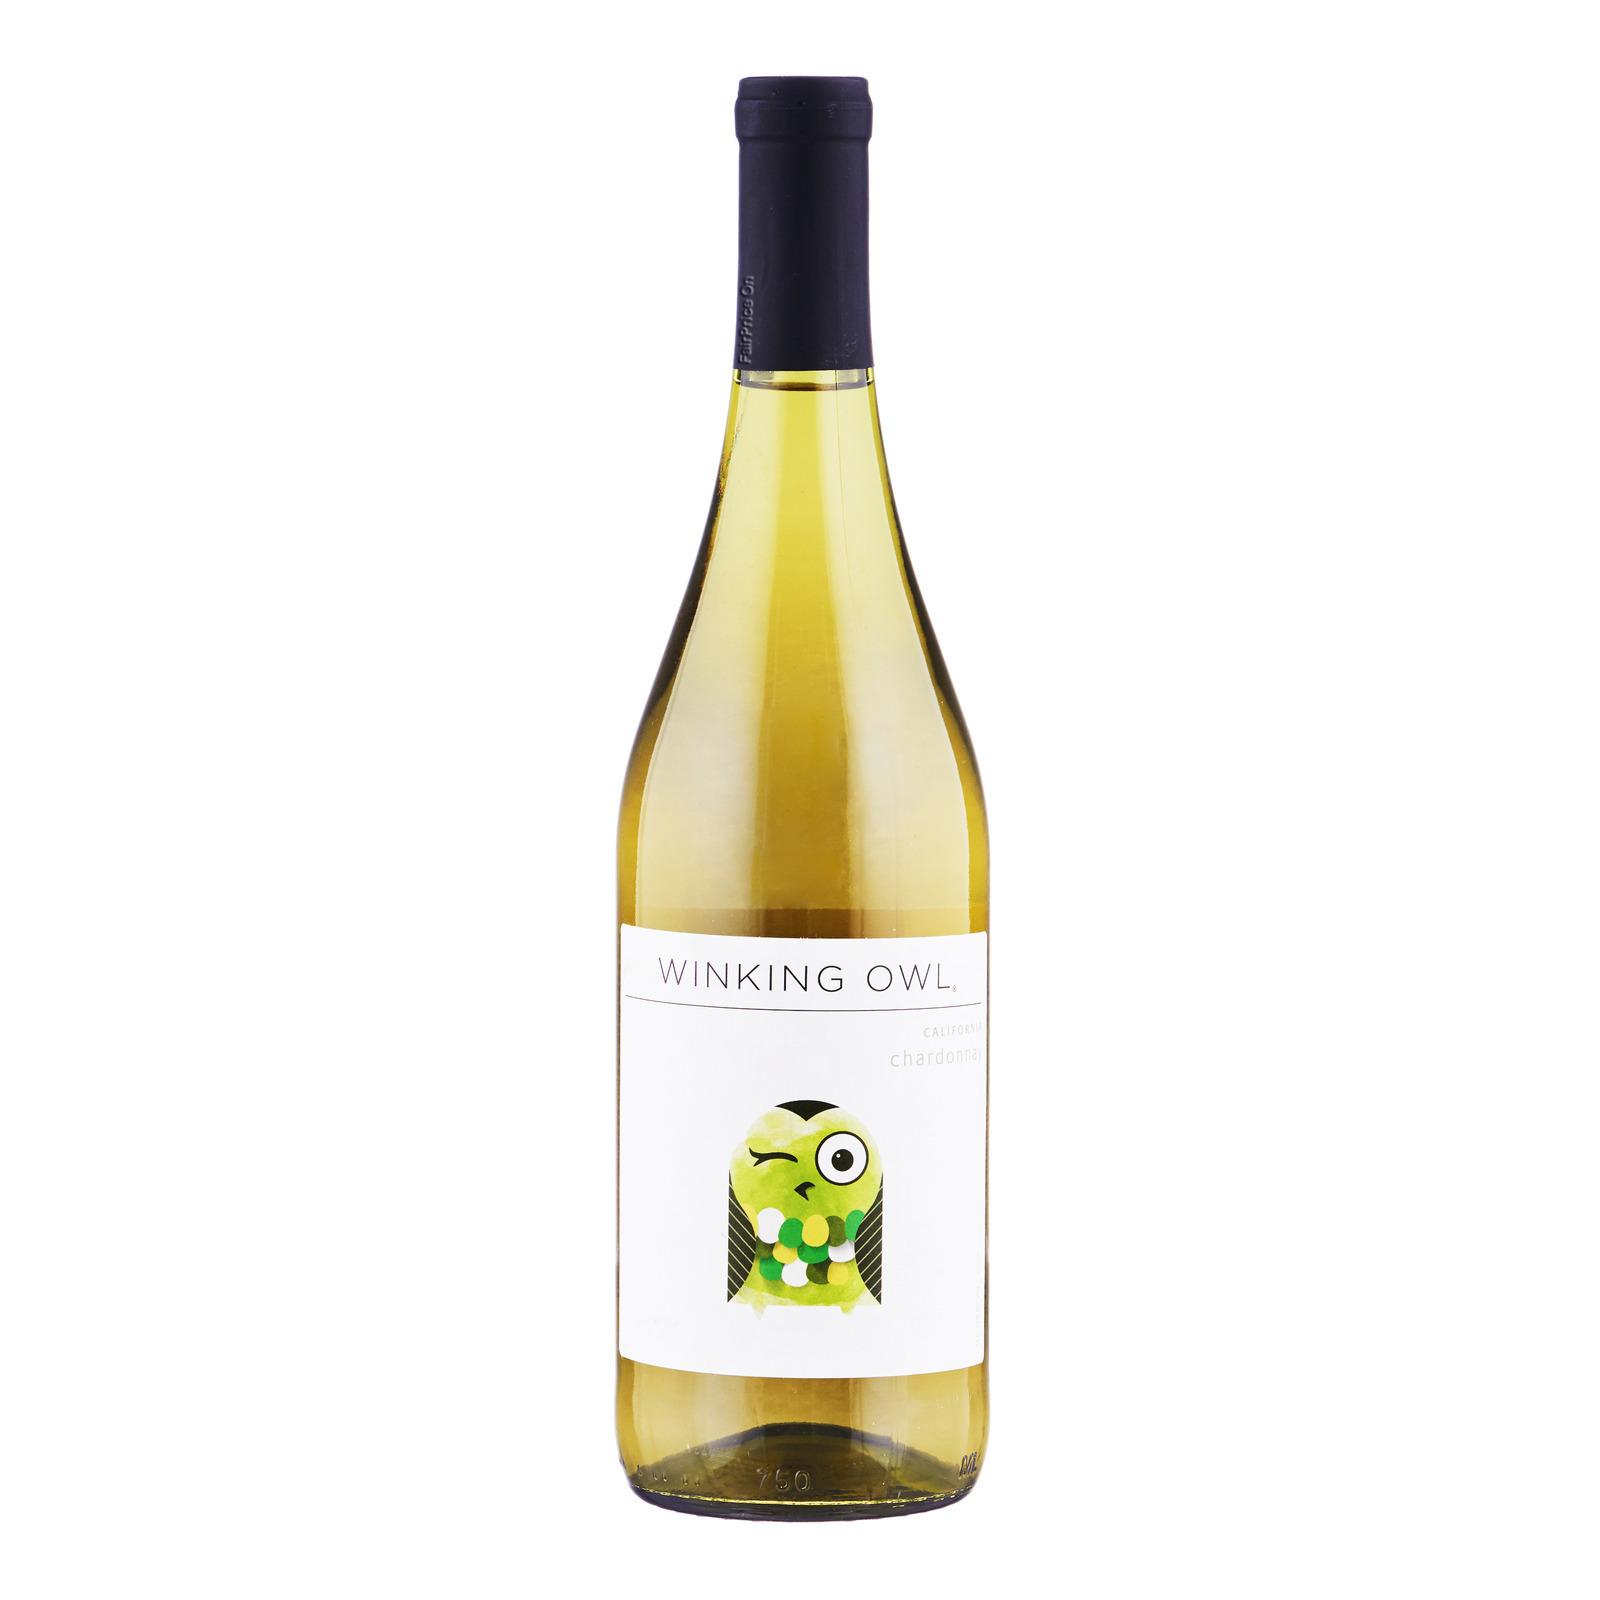 Winking Owl White Wine - Chardonnay